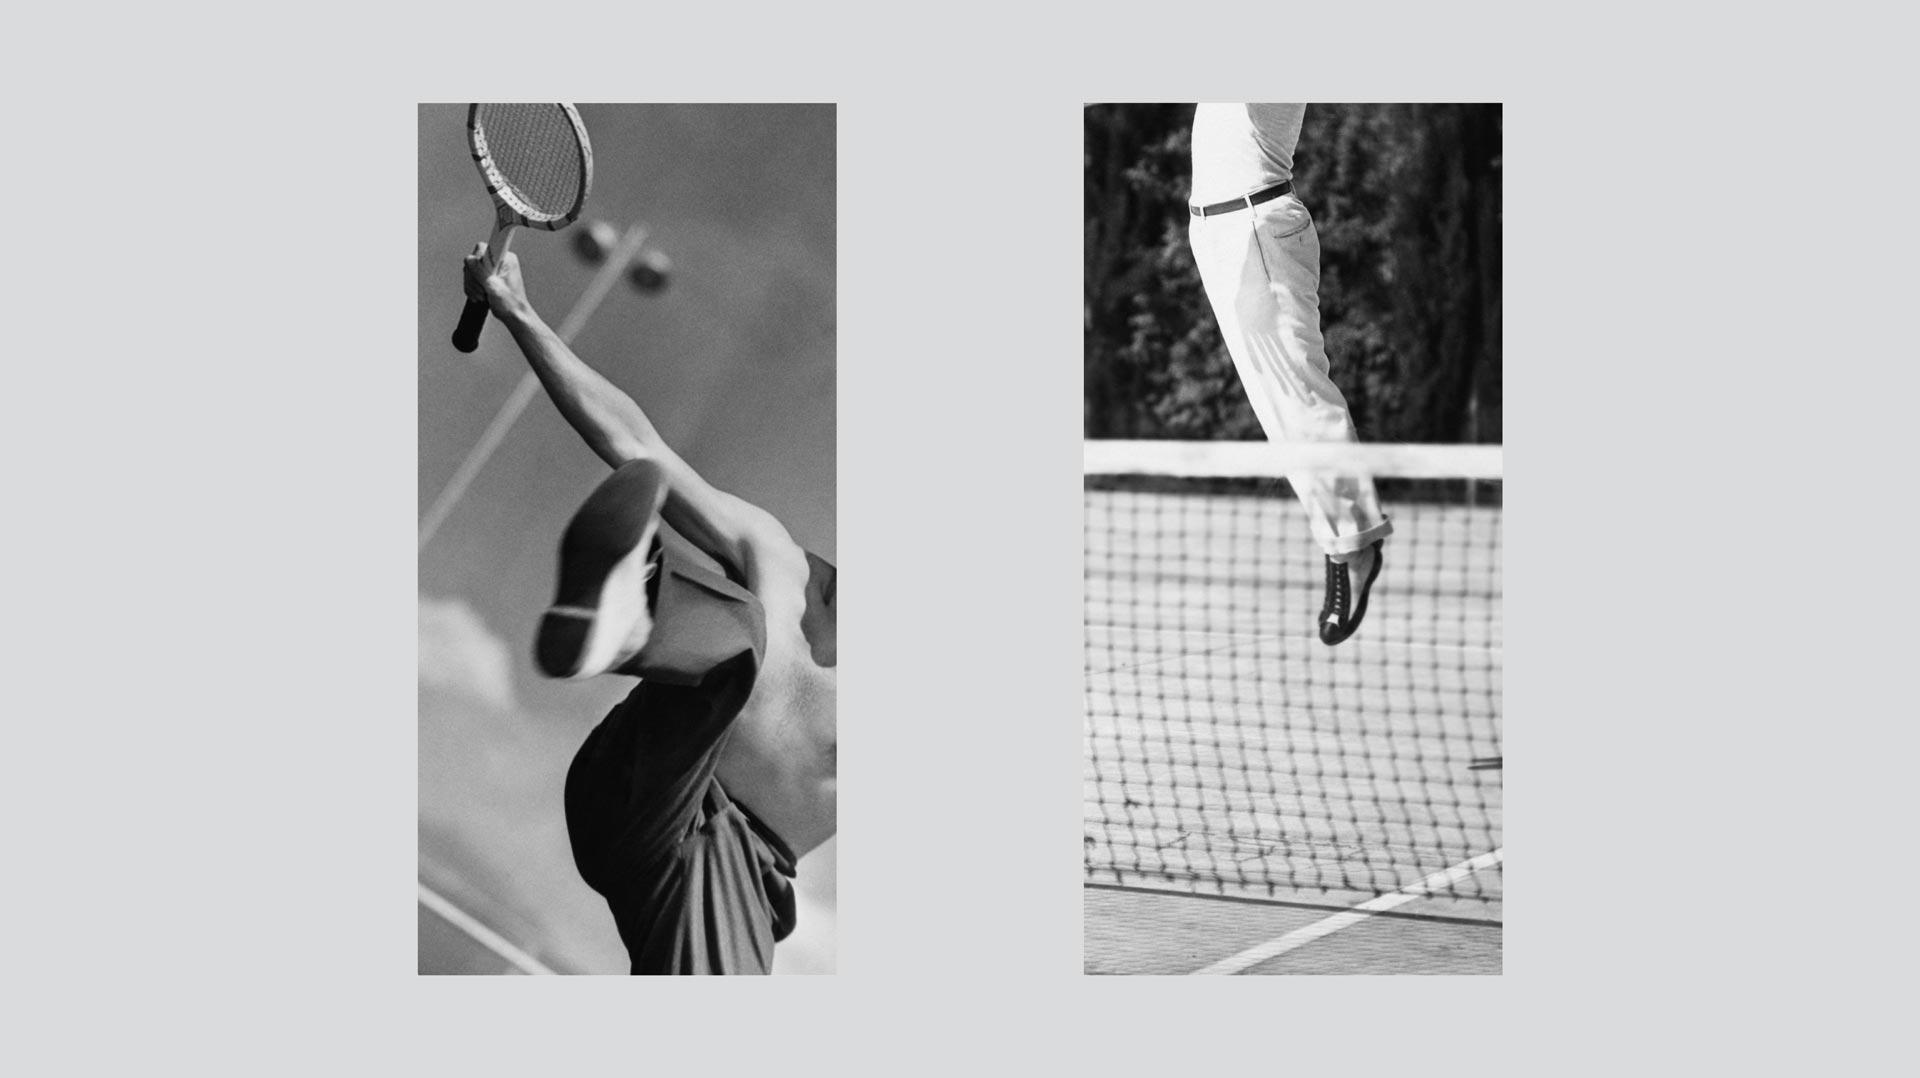 tenista-mem.jpg